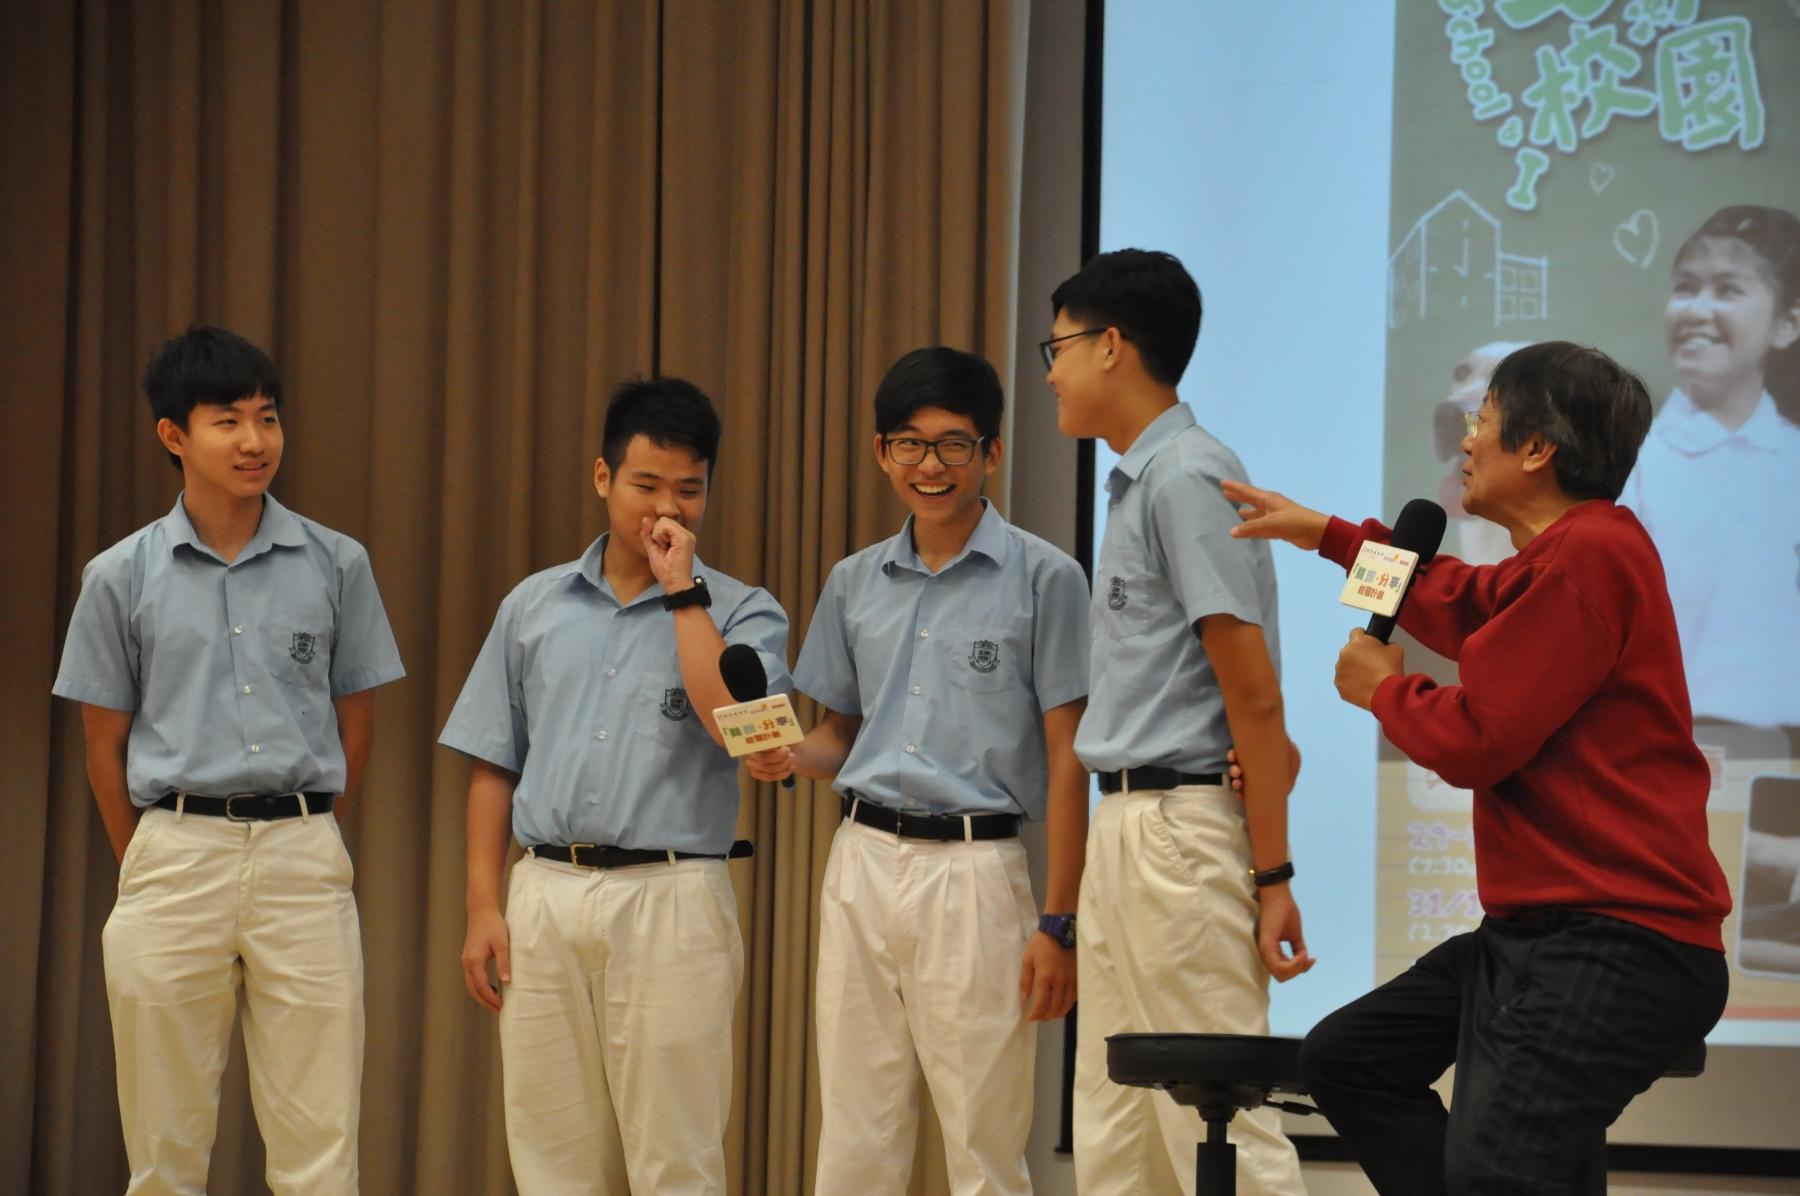 http://www.npc.edu.hk/sites/default/files/dsc_0022.jpg